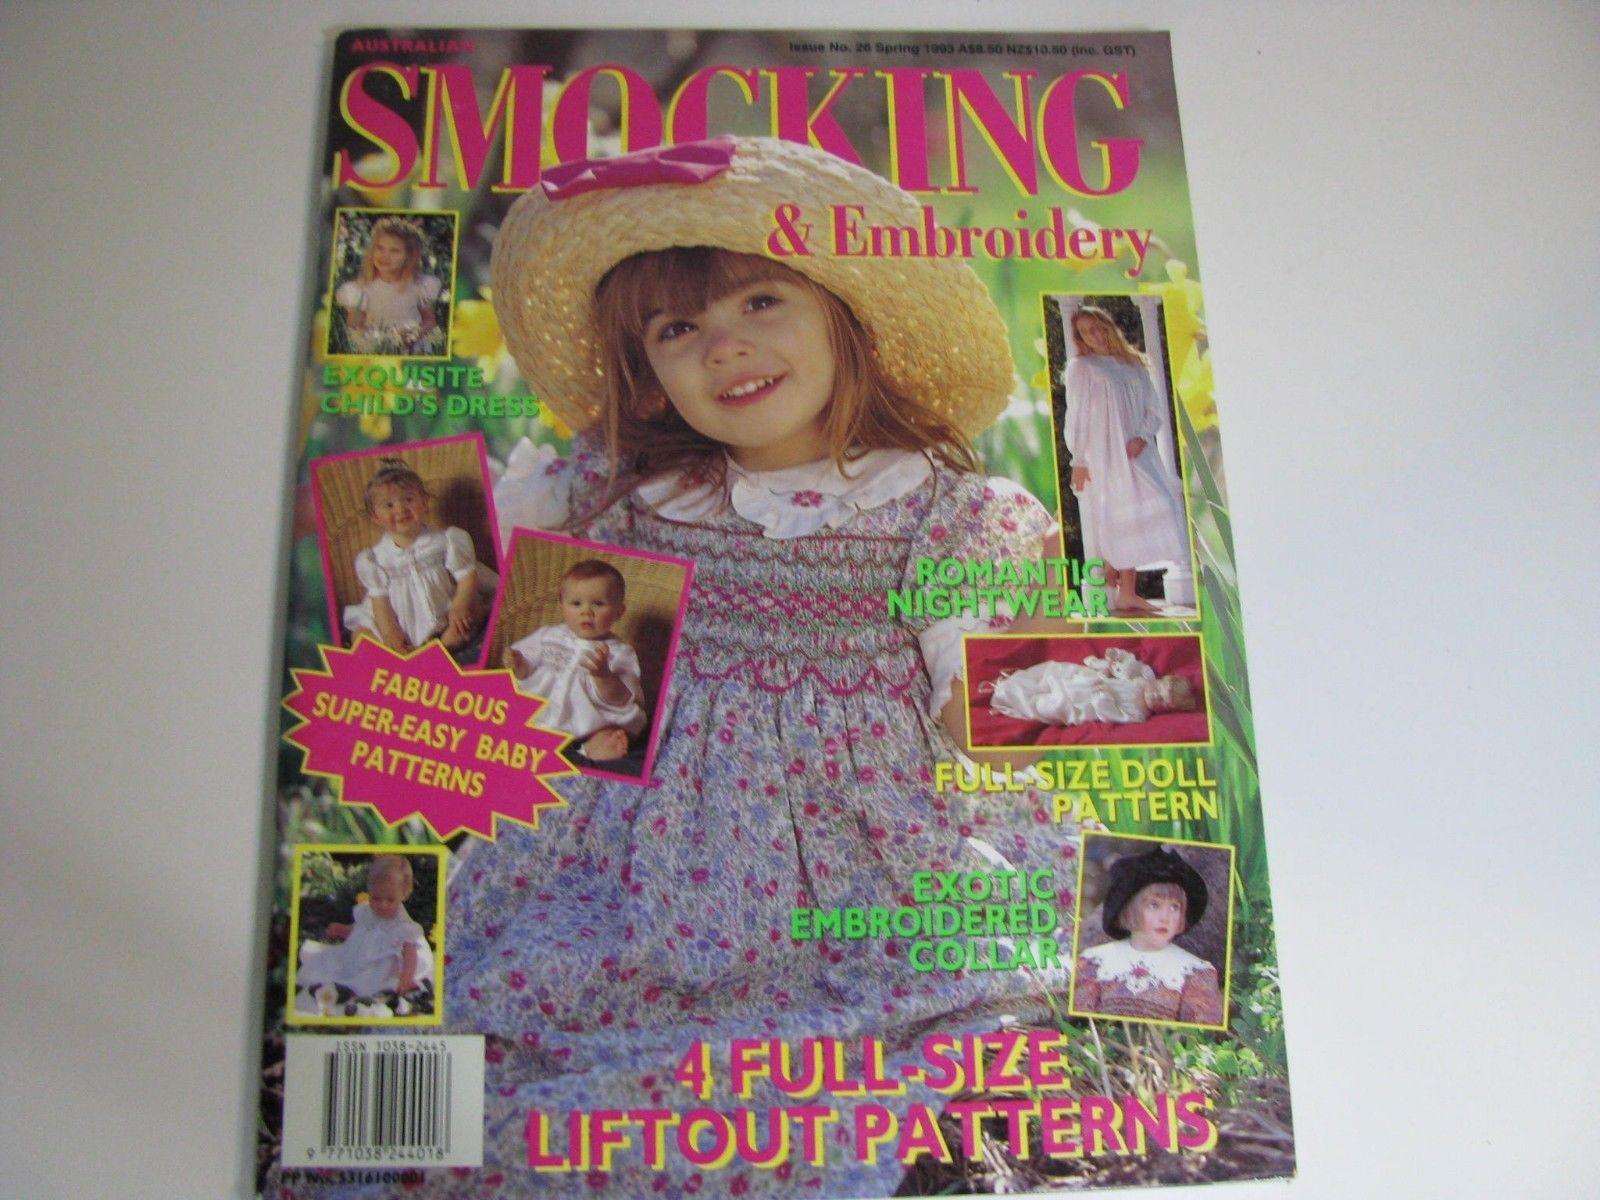 Issue 26 - Australian Smocking & Embroidery Magazine